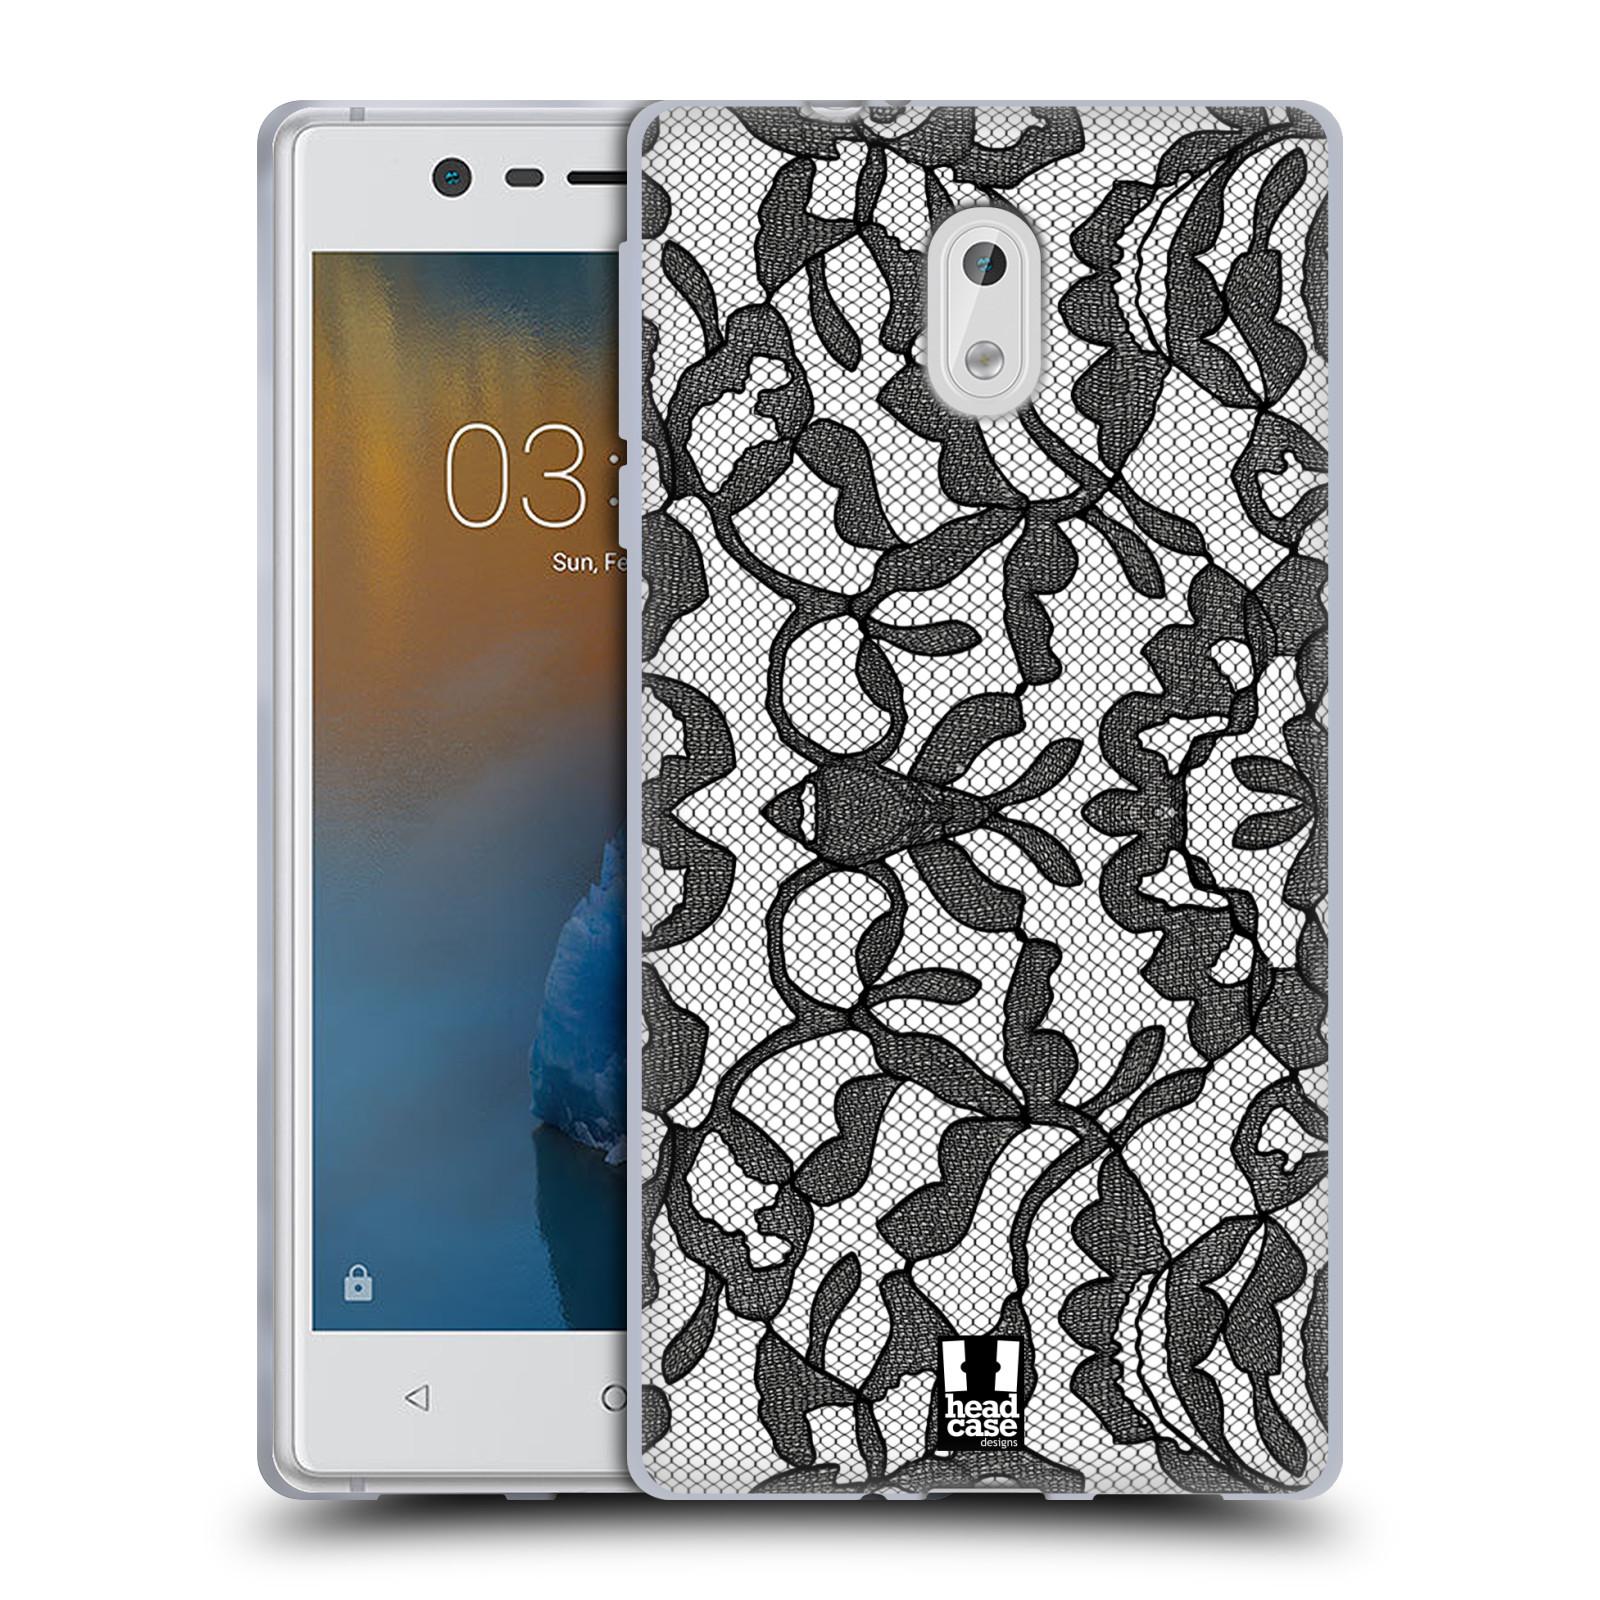 Silikonové pouzdro na mobil Nokia 3 Head Case - LEAFY KRAJKA